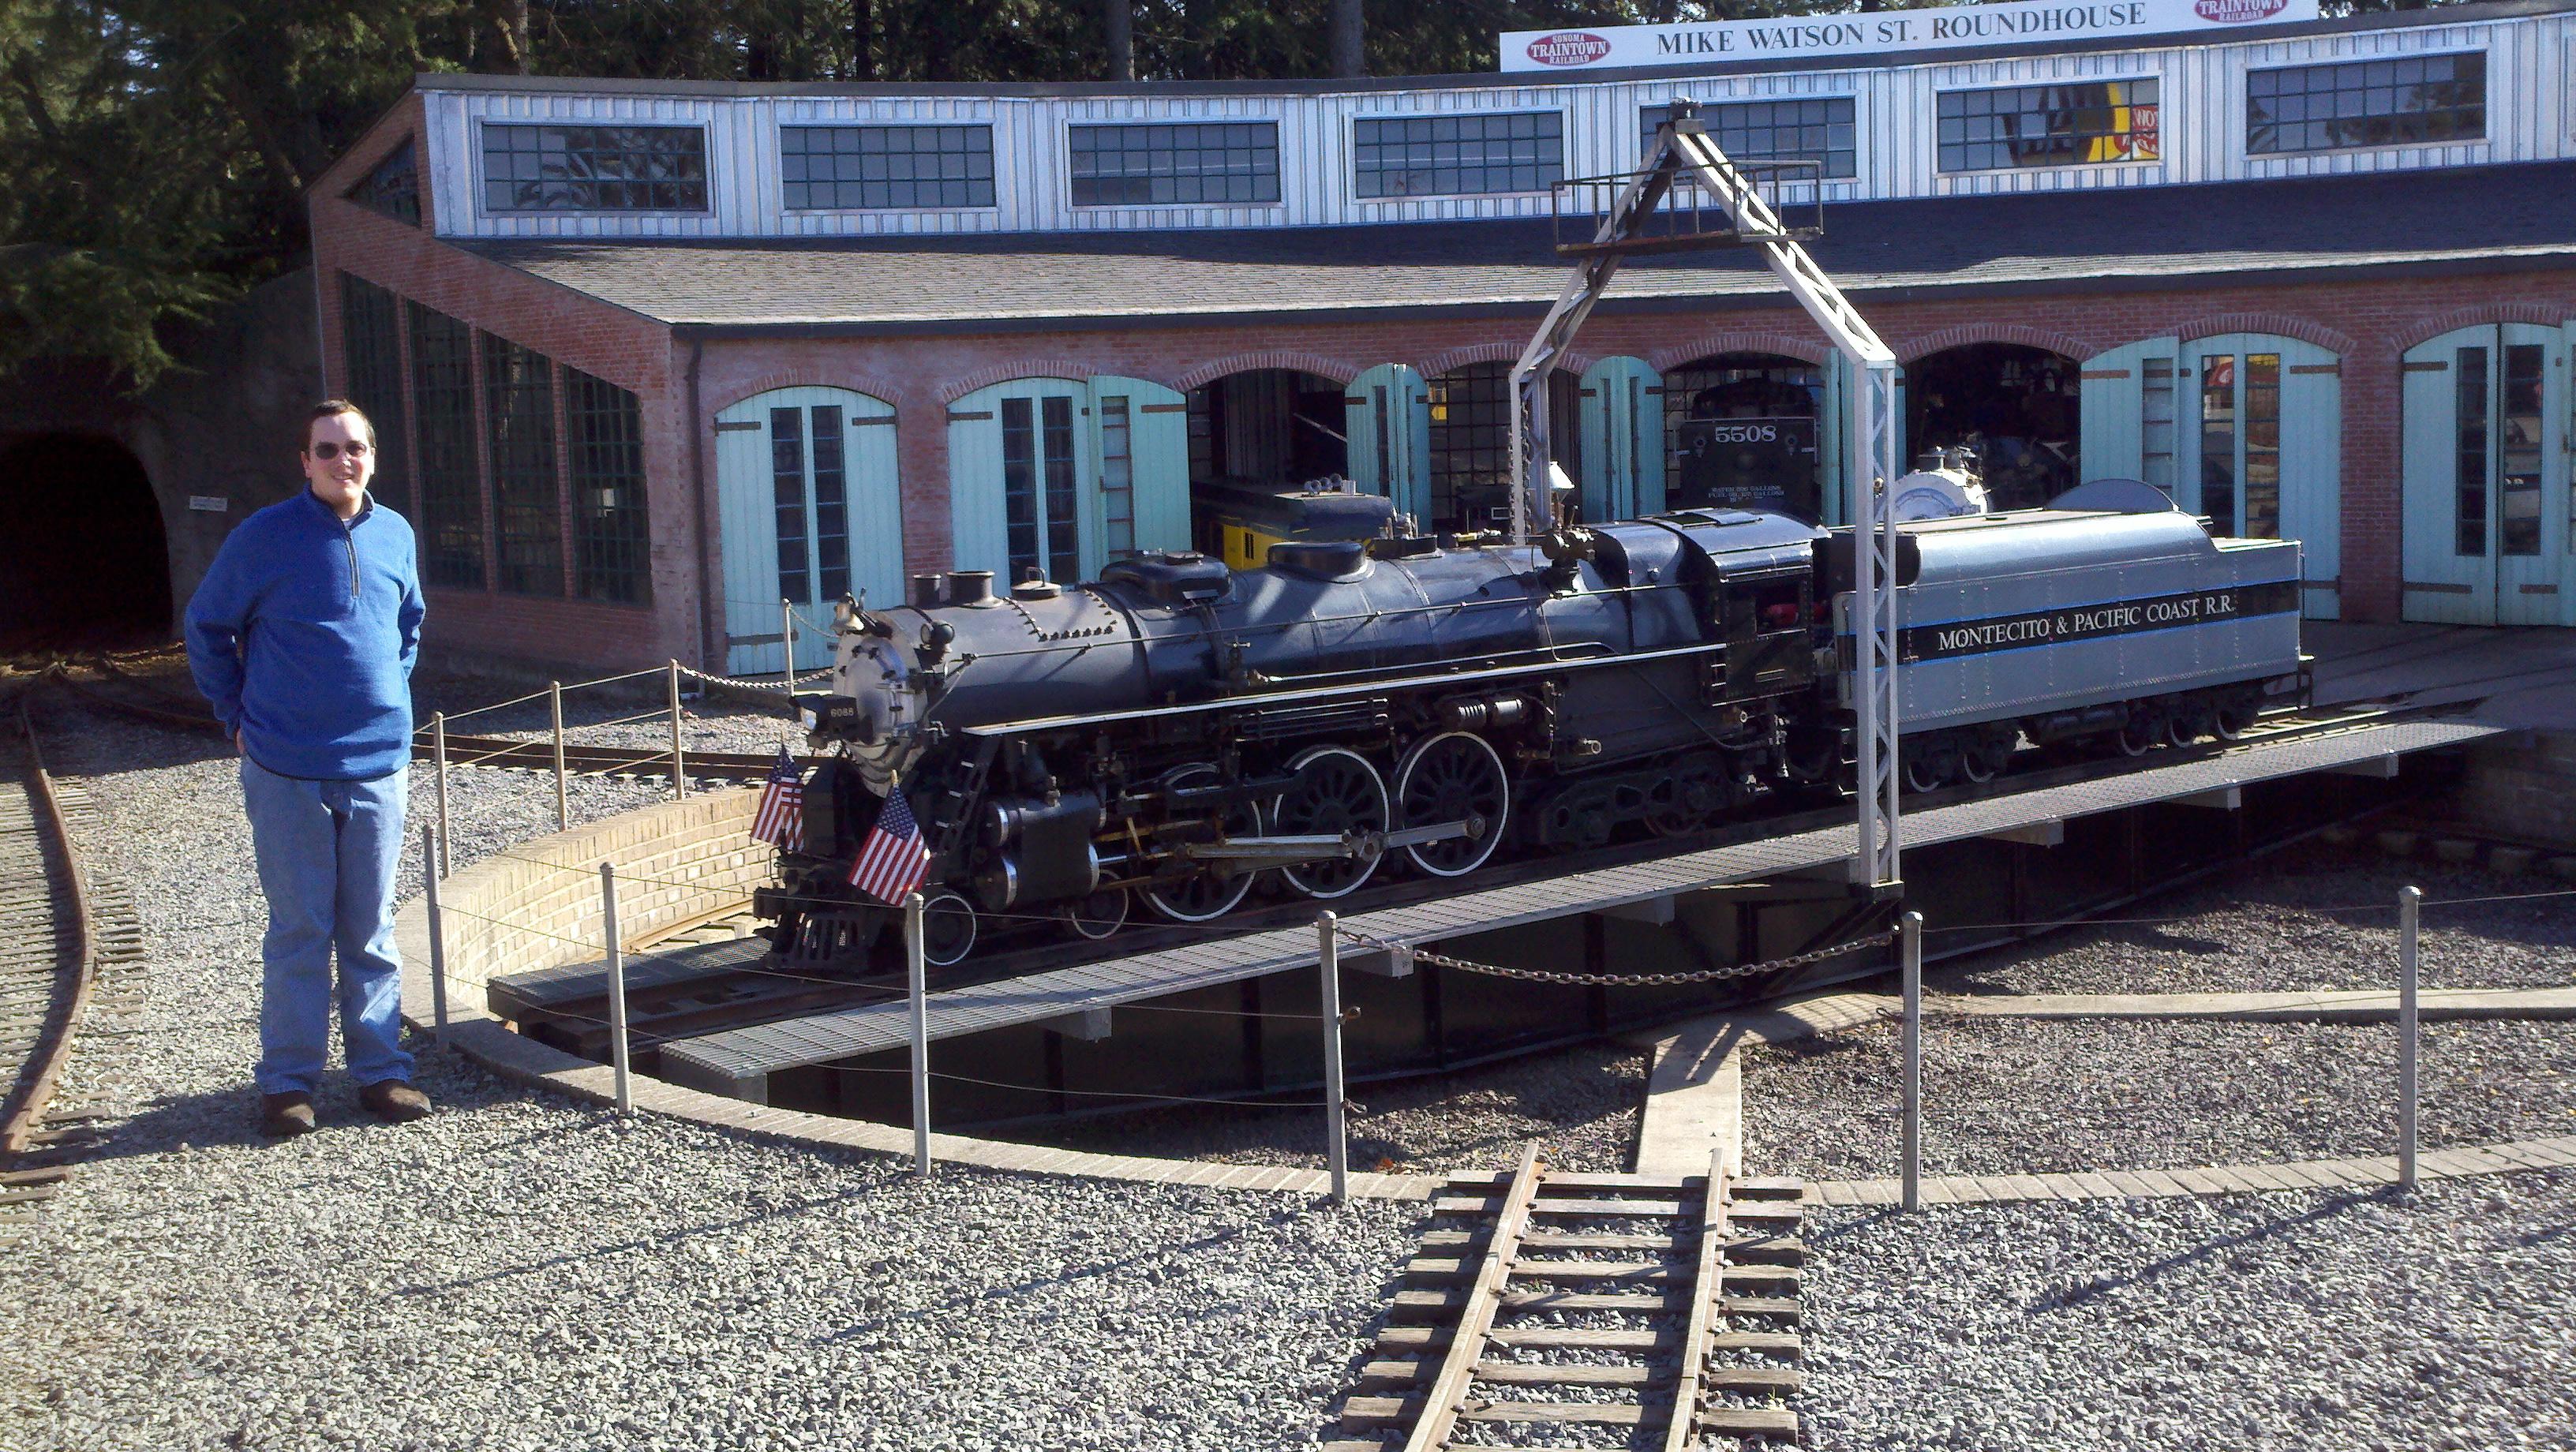 Sonoma TrainTown Railroad - Wikiwand